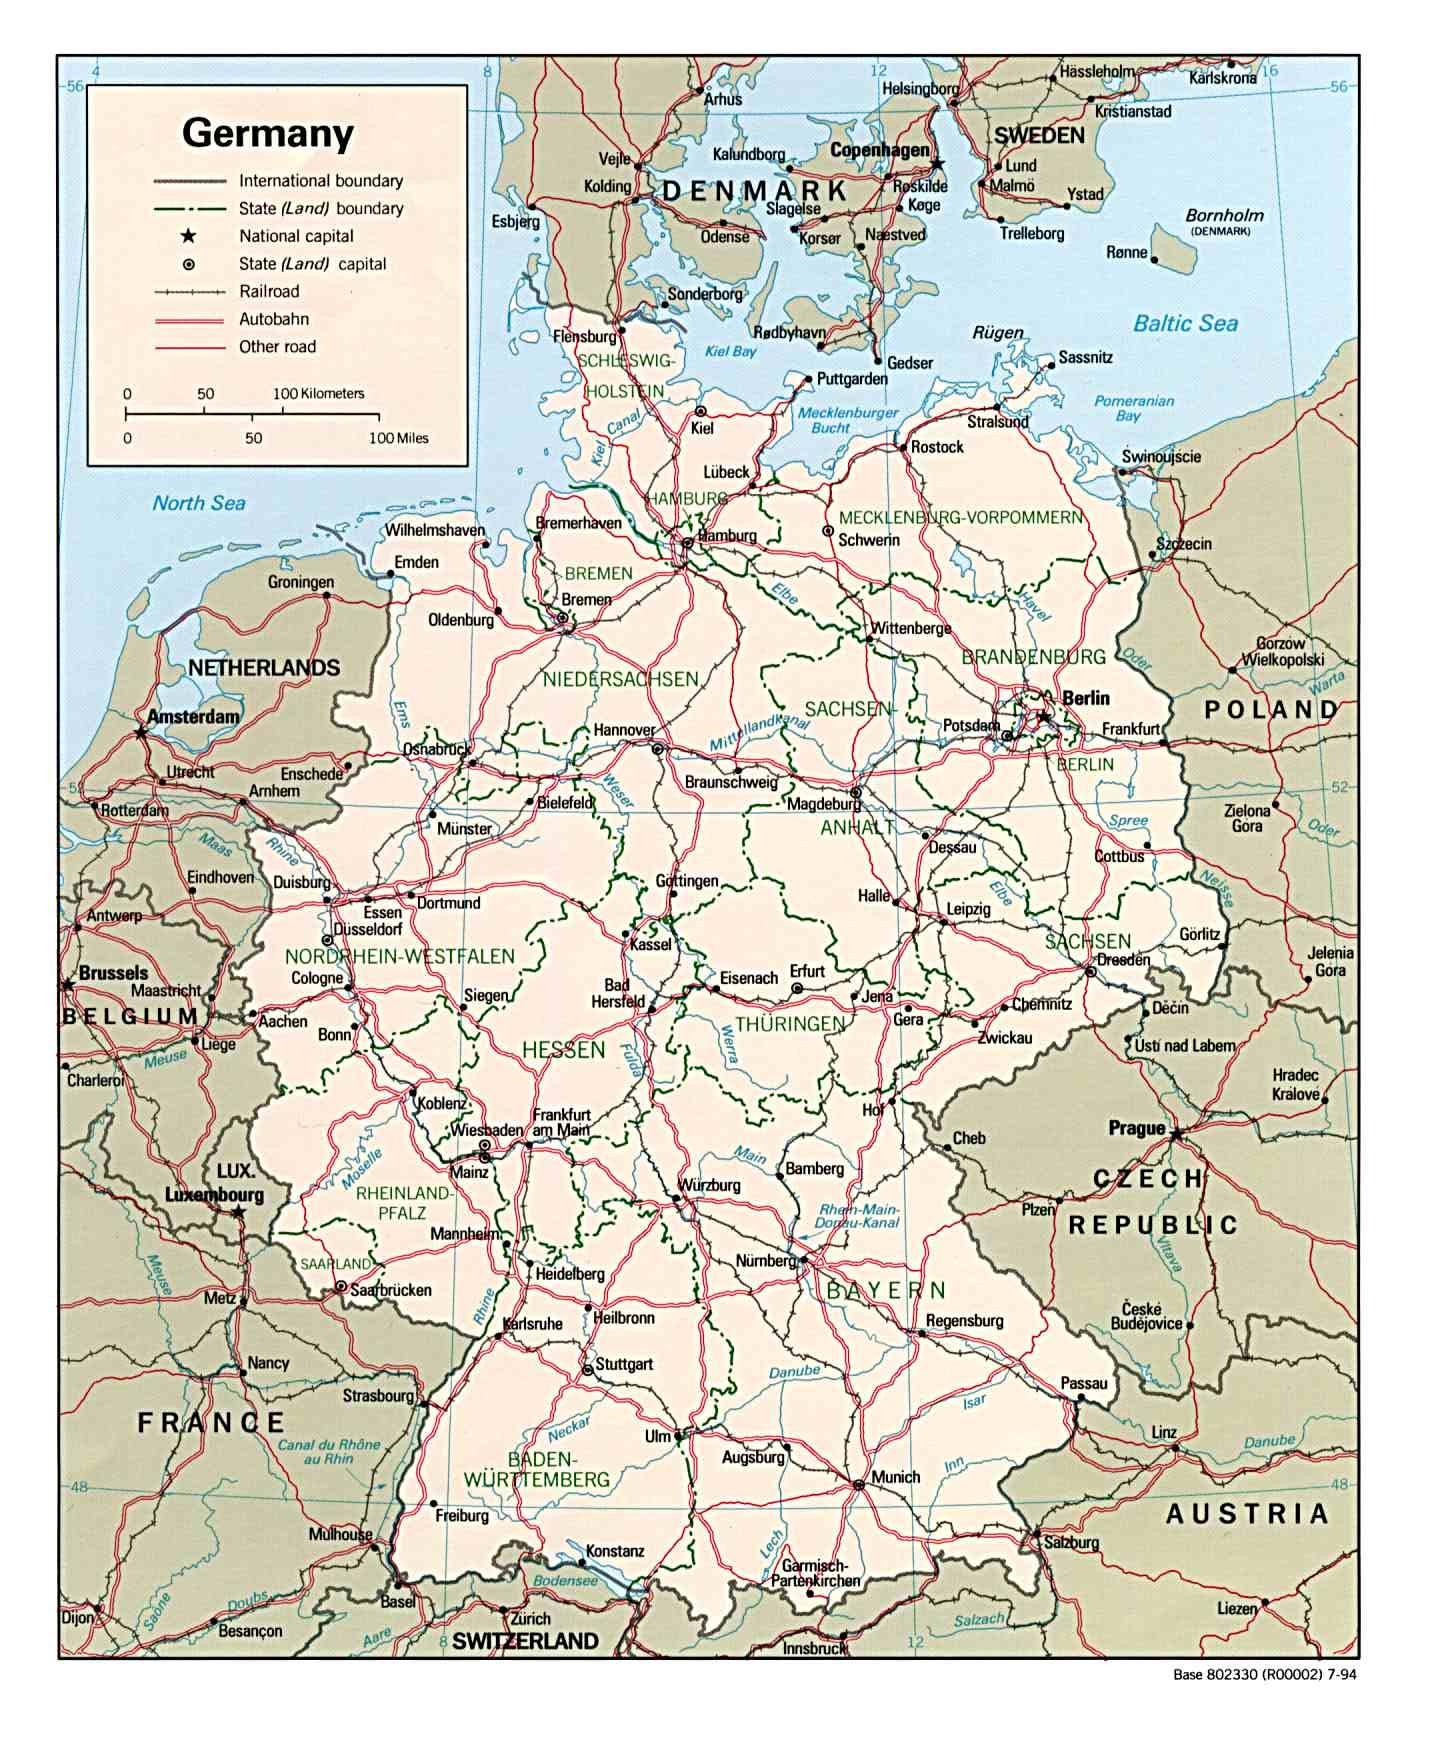 Map of Germany (Political Map) : Weltkarte.com - Karten und ...